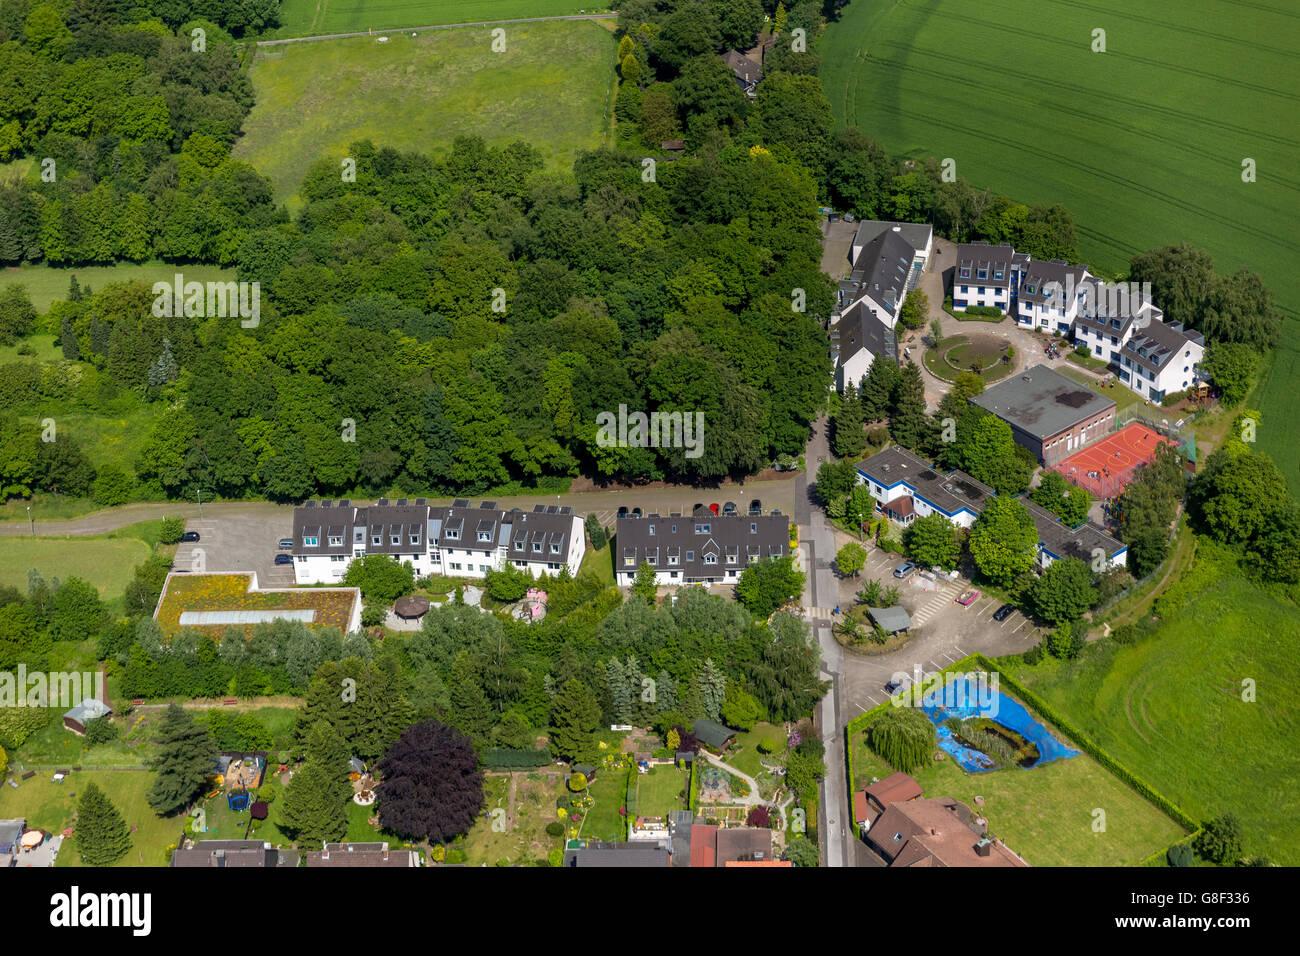 Aerial view, Peace Village Oberhausen e.V. Schmachtenberg, Oberhausen, Ruhr region, North Rhine Westphalia, Germany, - Stock Image